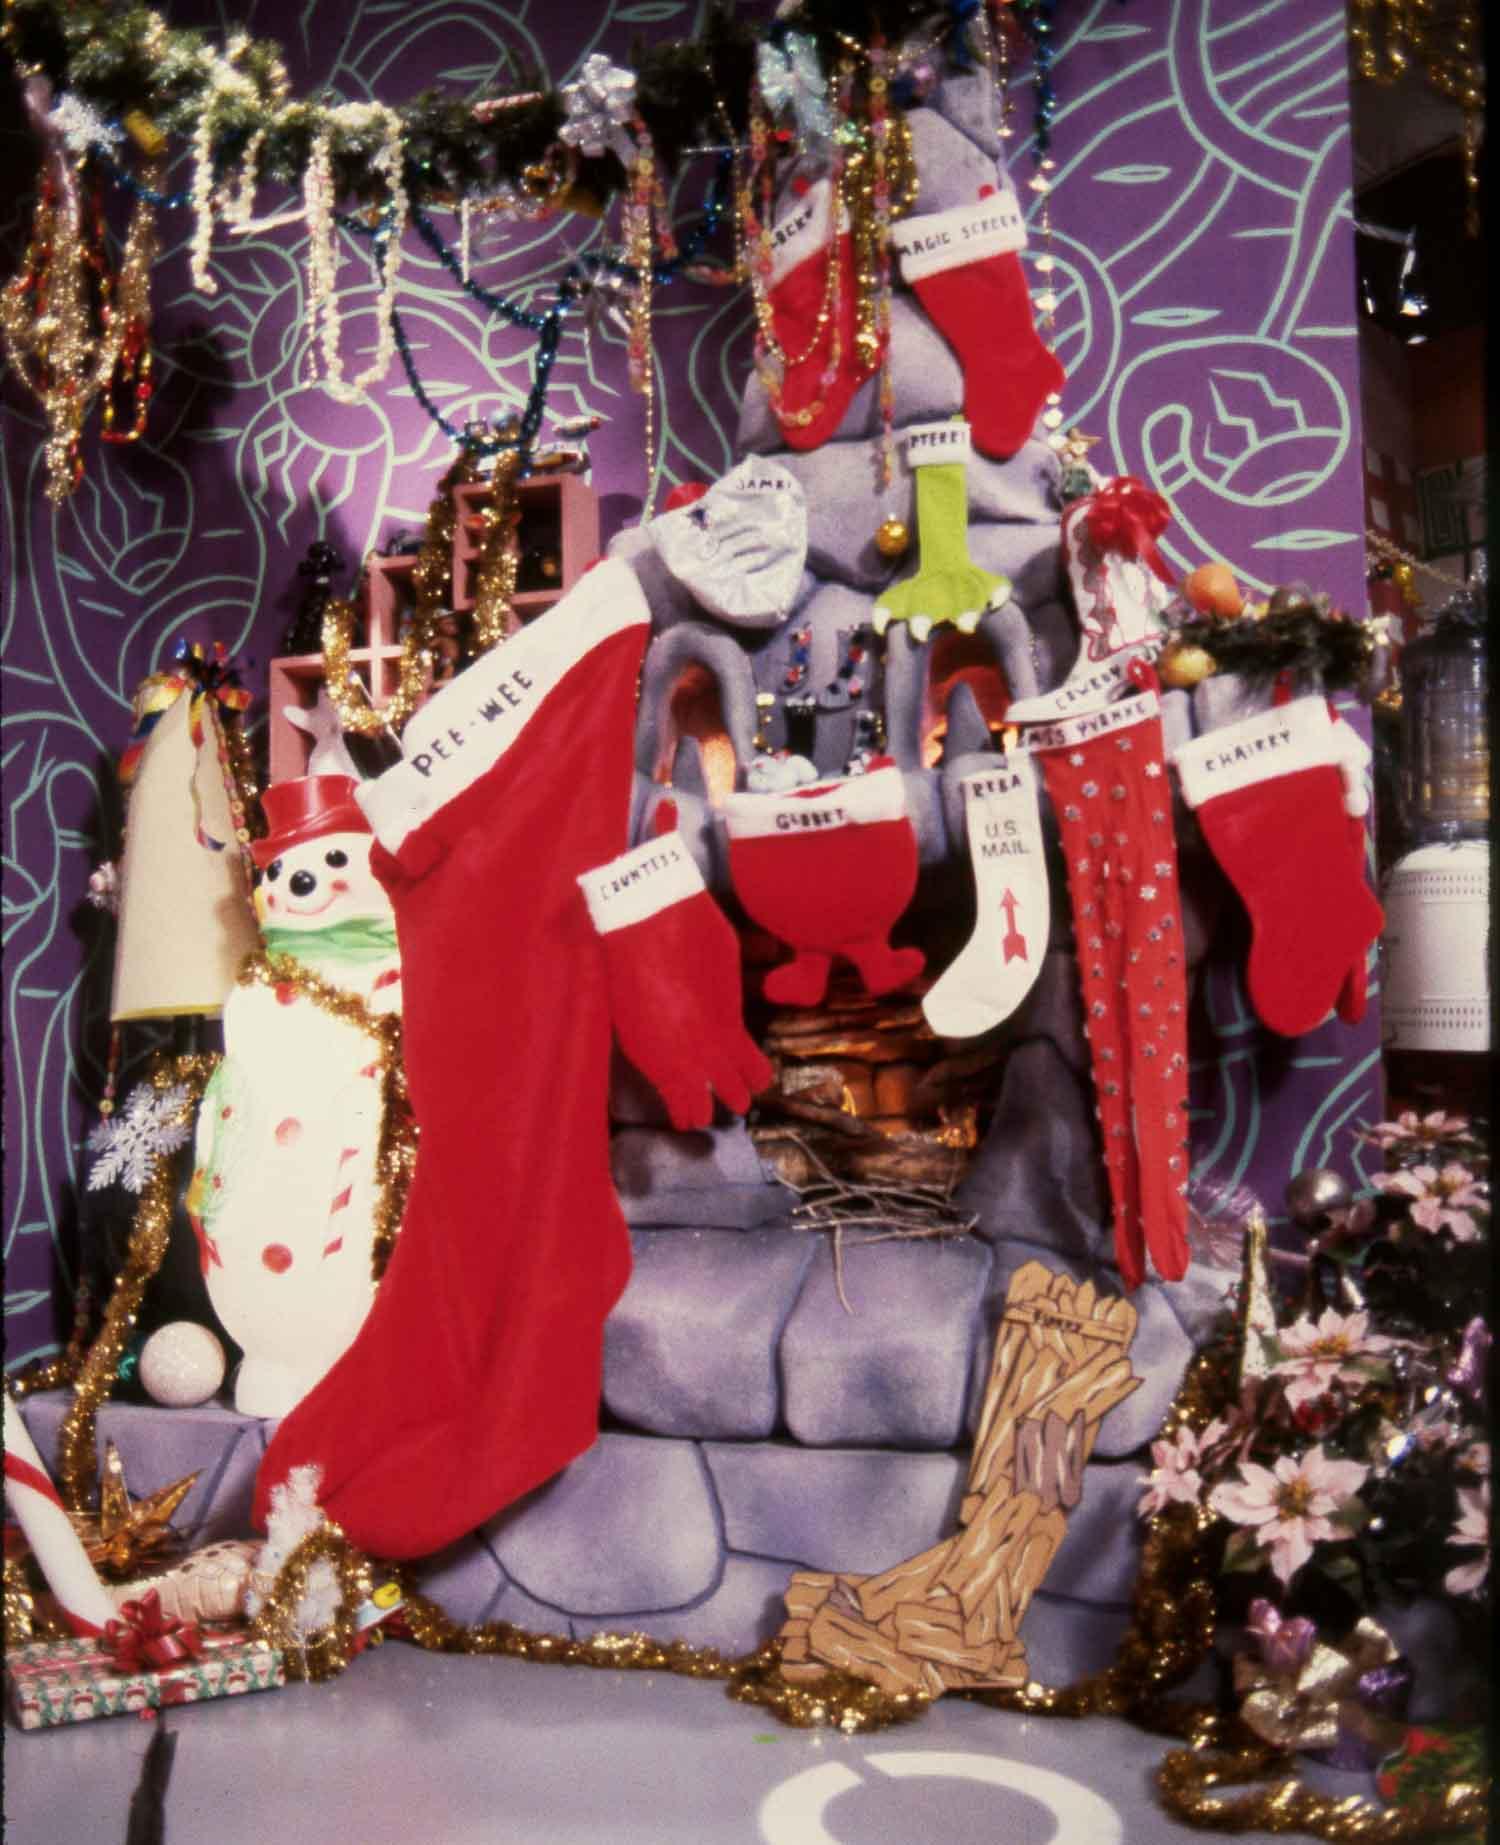 Playhouse characters Christmas stockings